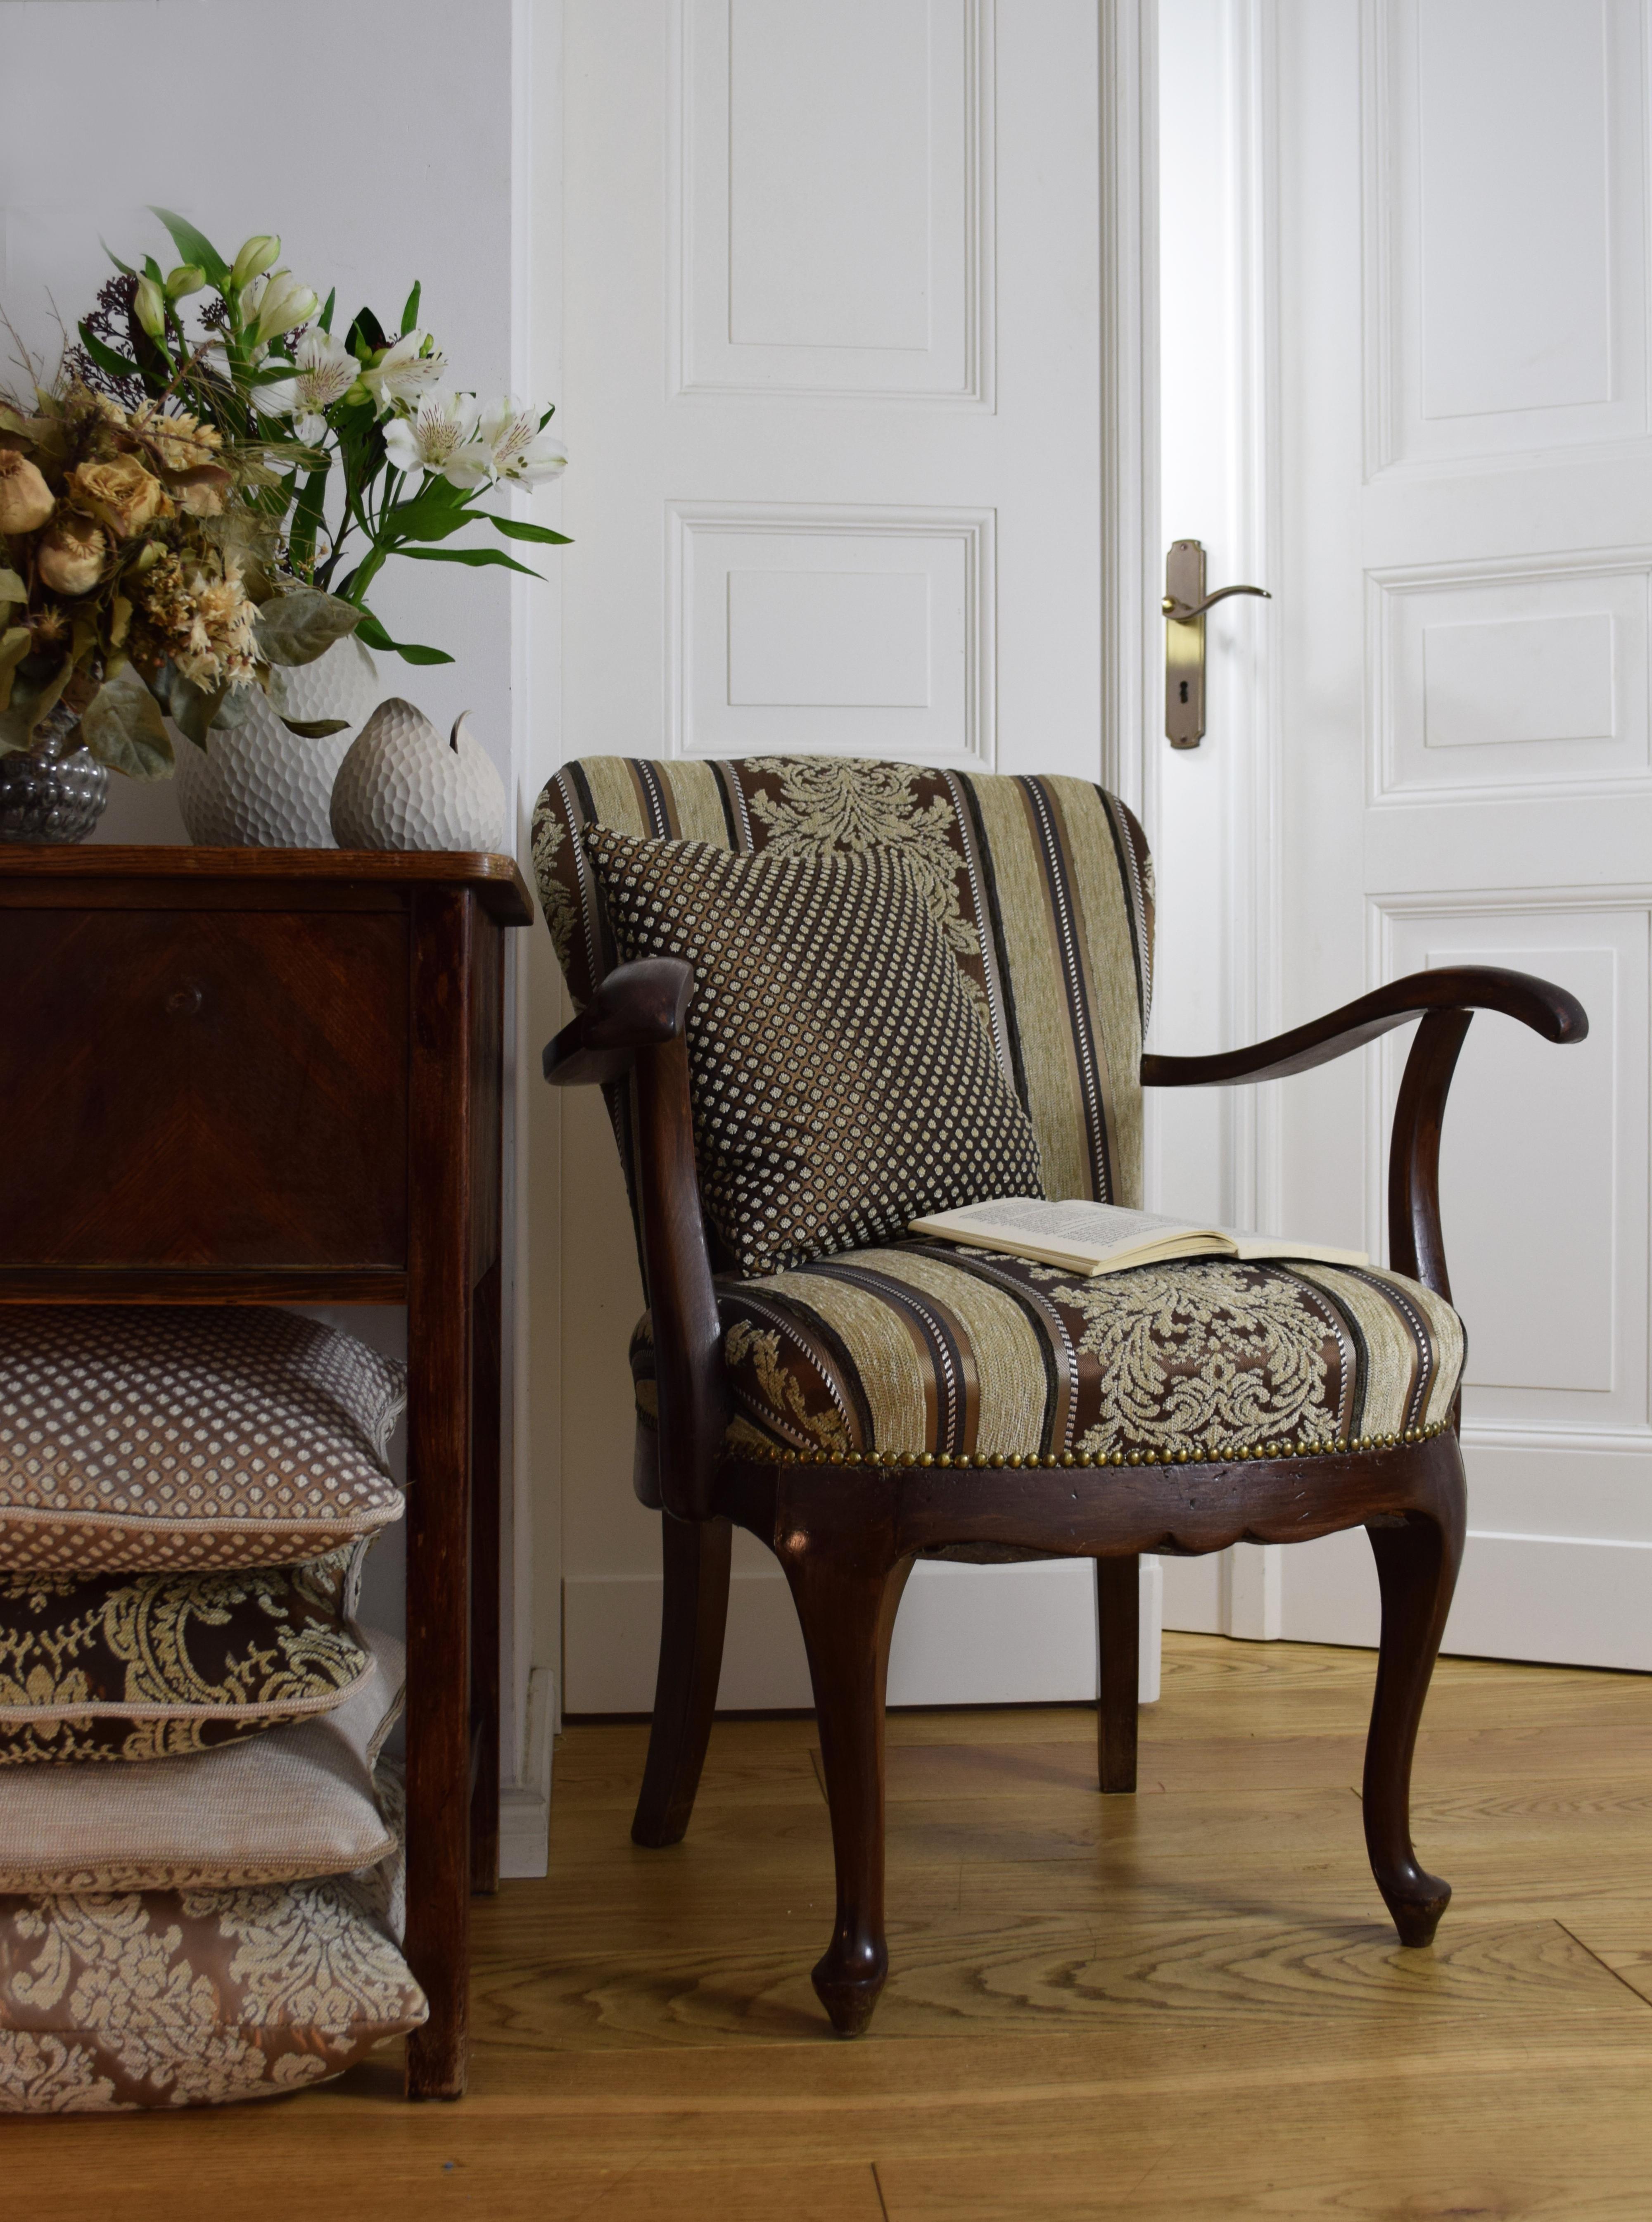 die wohnwerkstatt kupferzell moderne klassik. Black Bedroom Furniture Sets. Home Design Ideas